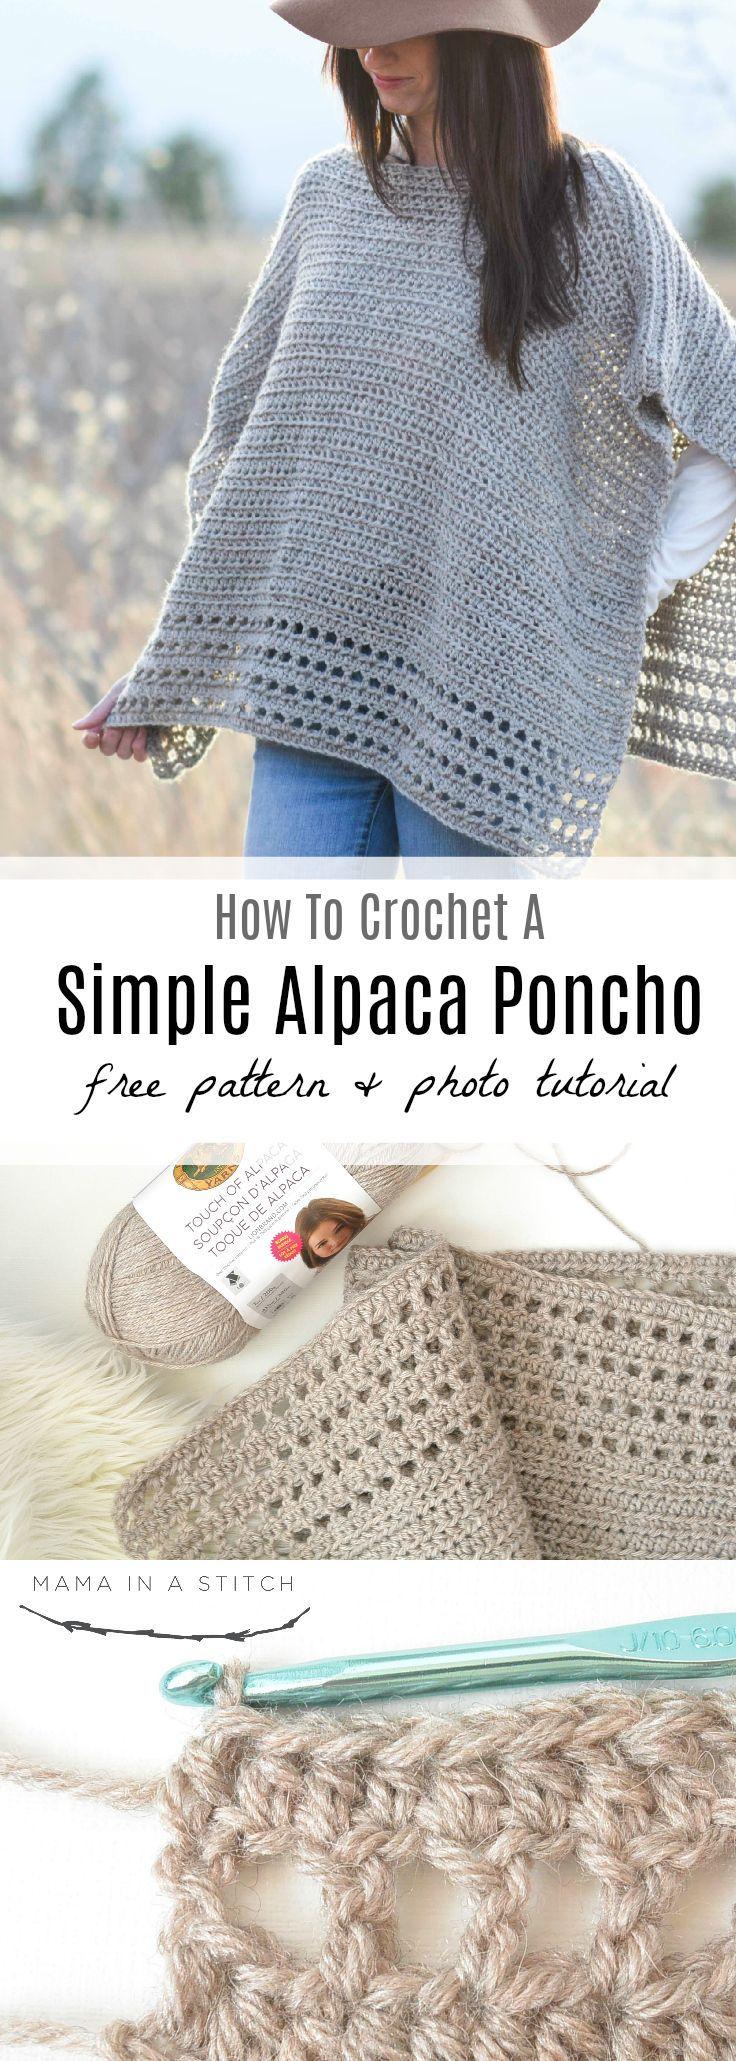 Light Alpaca Poncho Crochet Pattern | Patrones | Pinterest | Ponchos ...